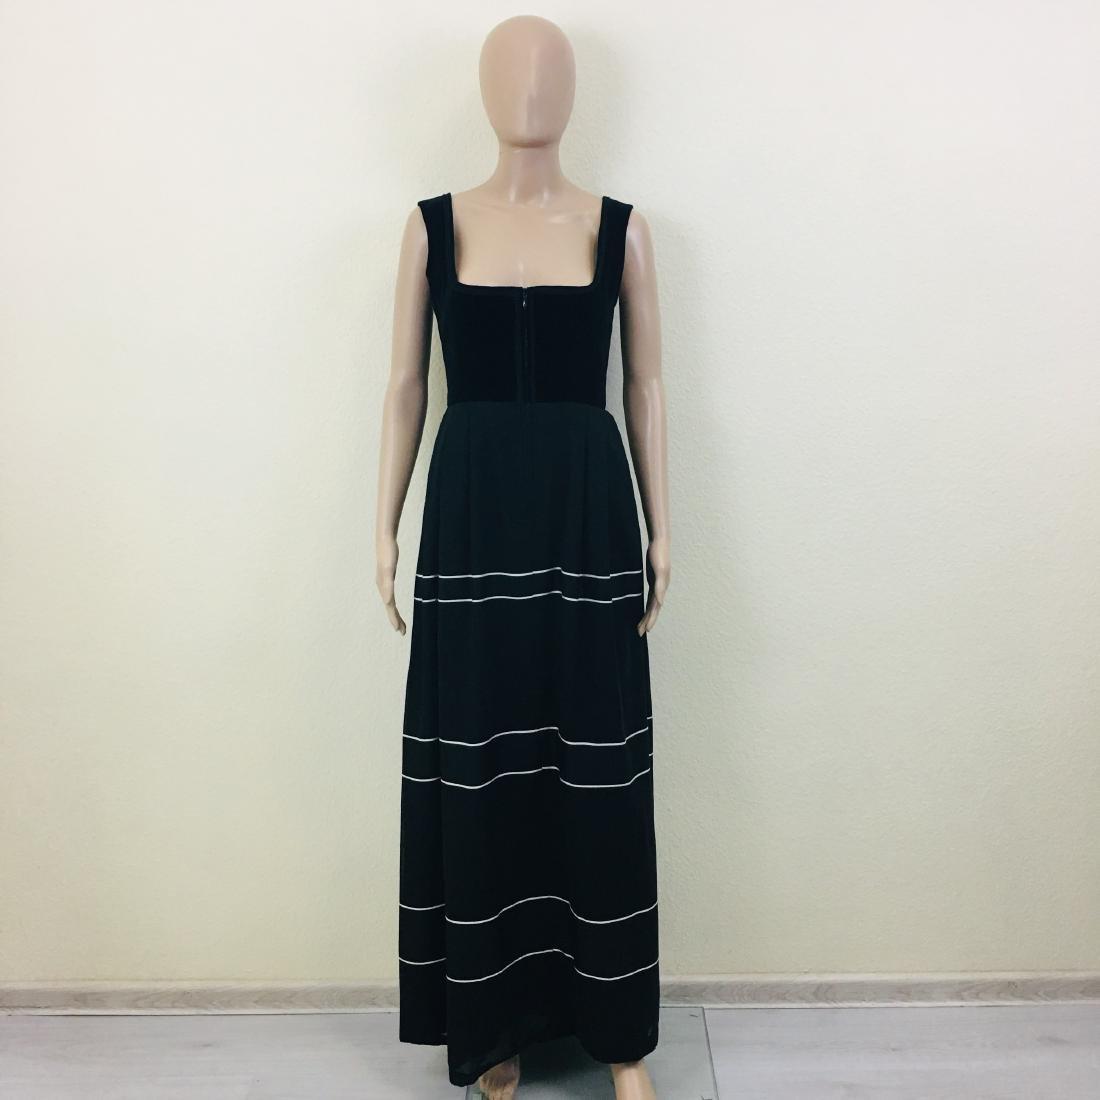 Vintage Women's Black Tyrolean Drindl Dress